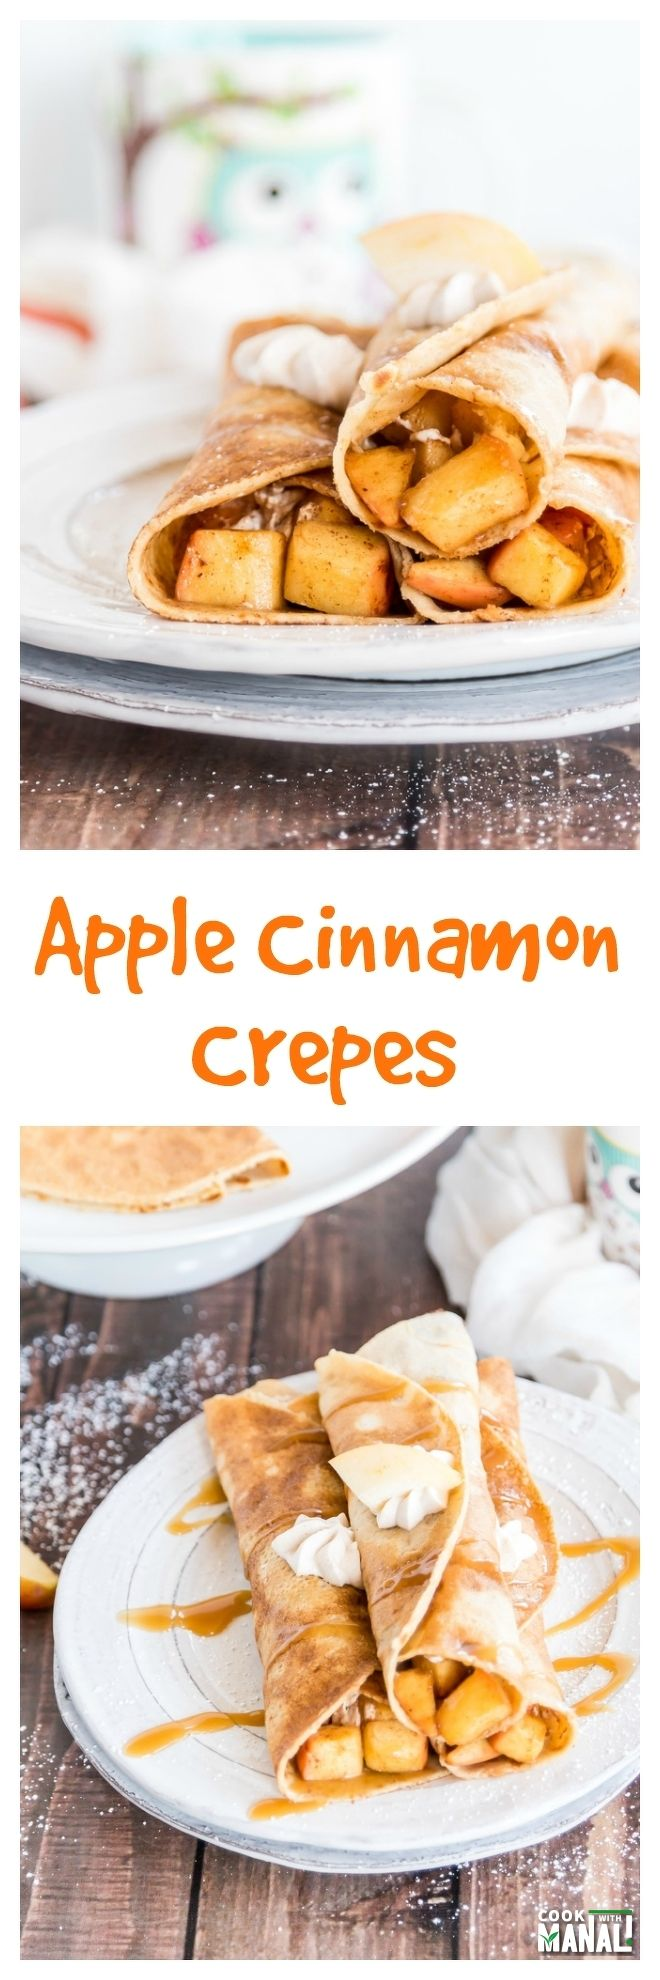 Apple Cinnamon Crepes Collage